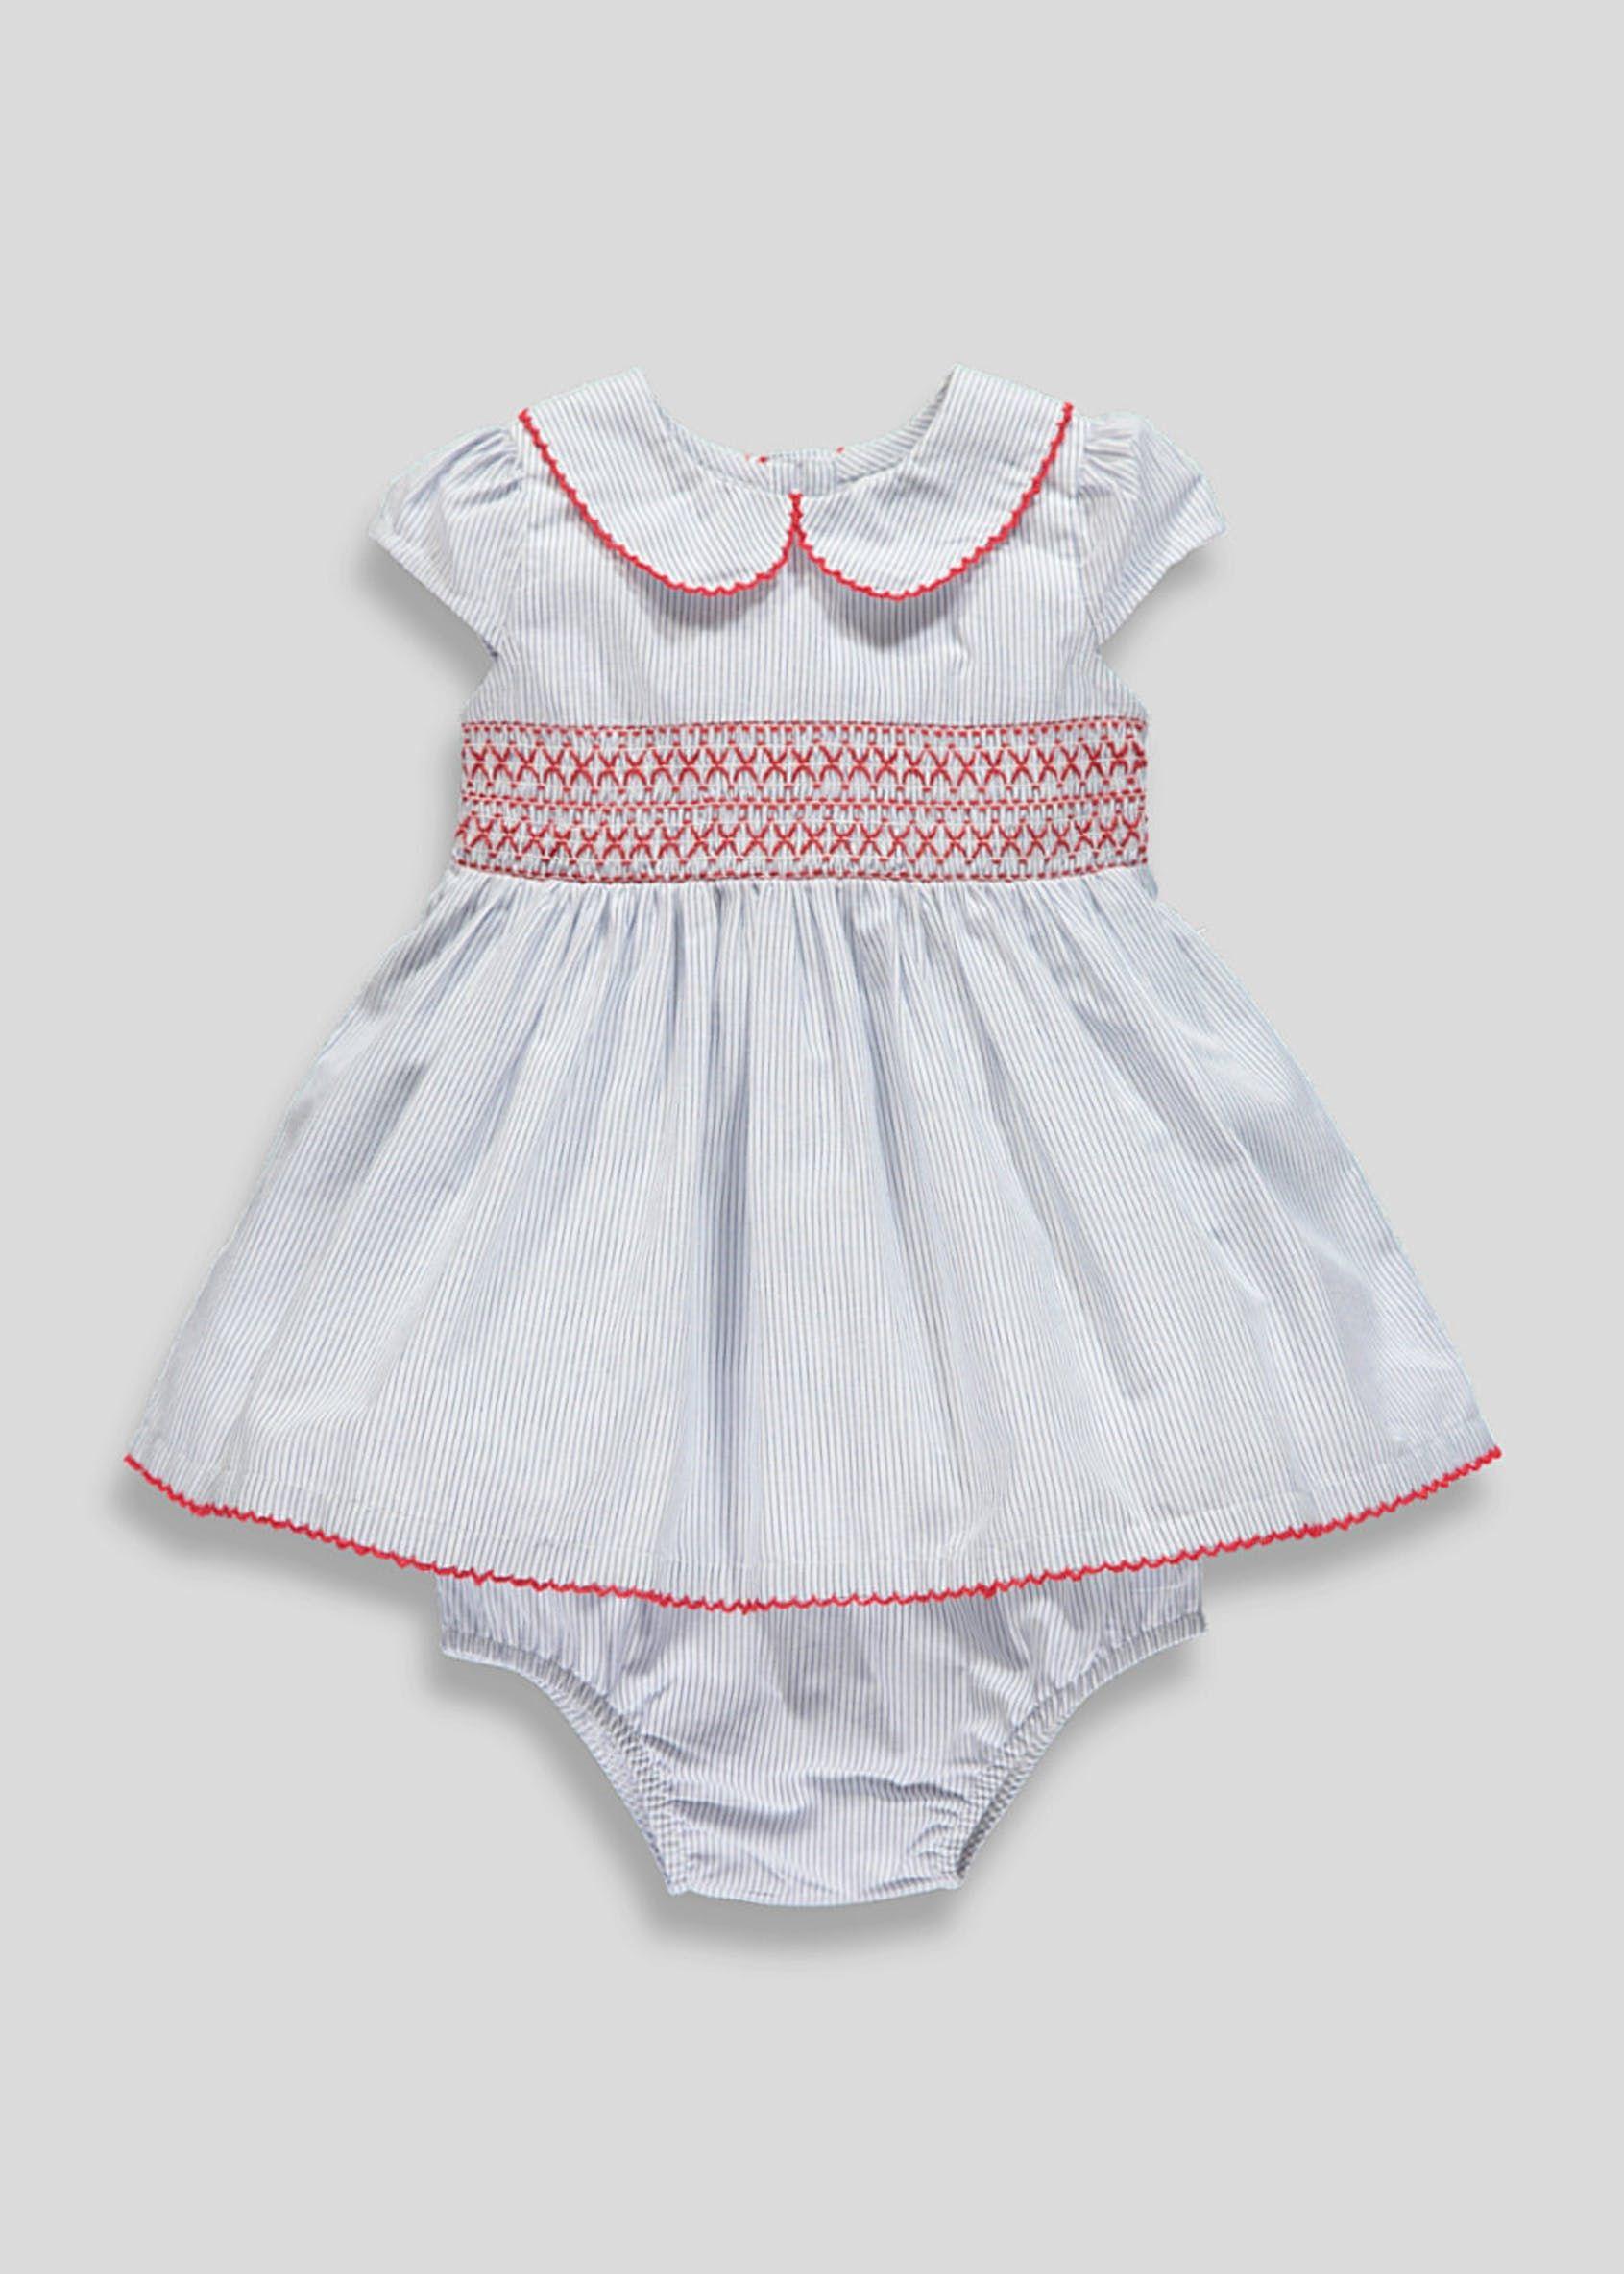 79d312ec3 Girls Stripe Dress & Knickers Set (Newborn-18mths)   Baby/older kids ...